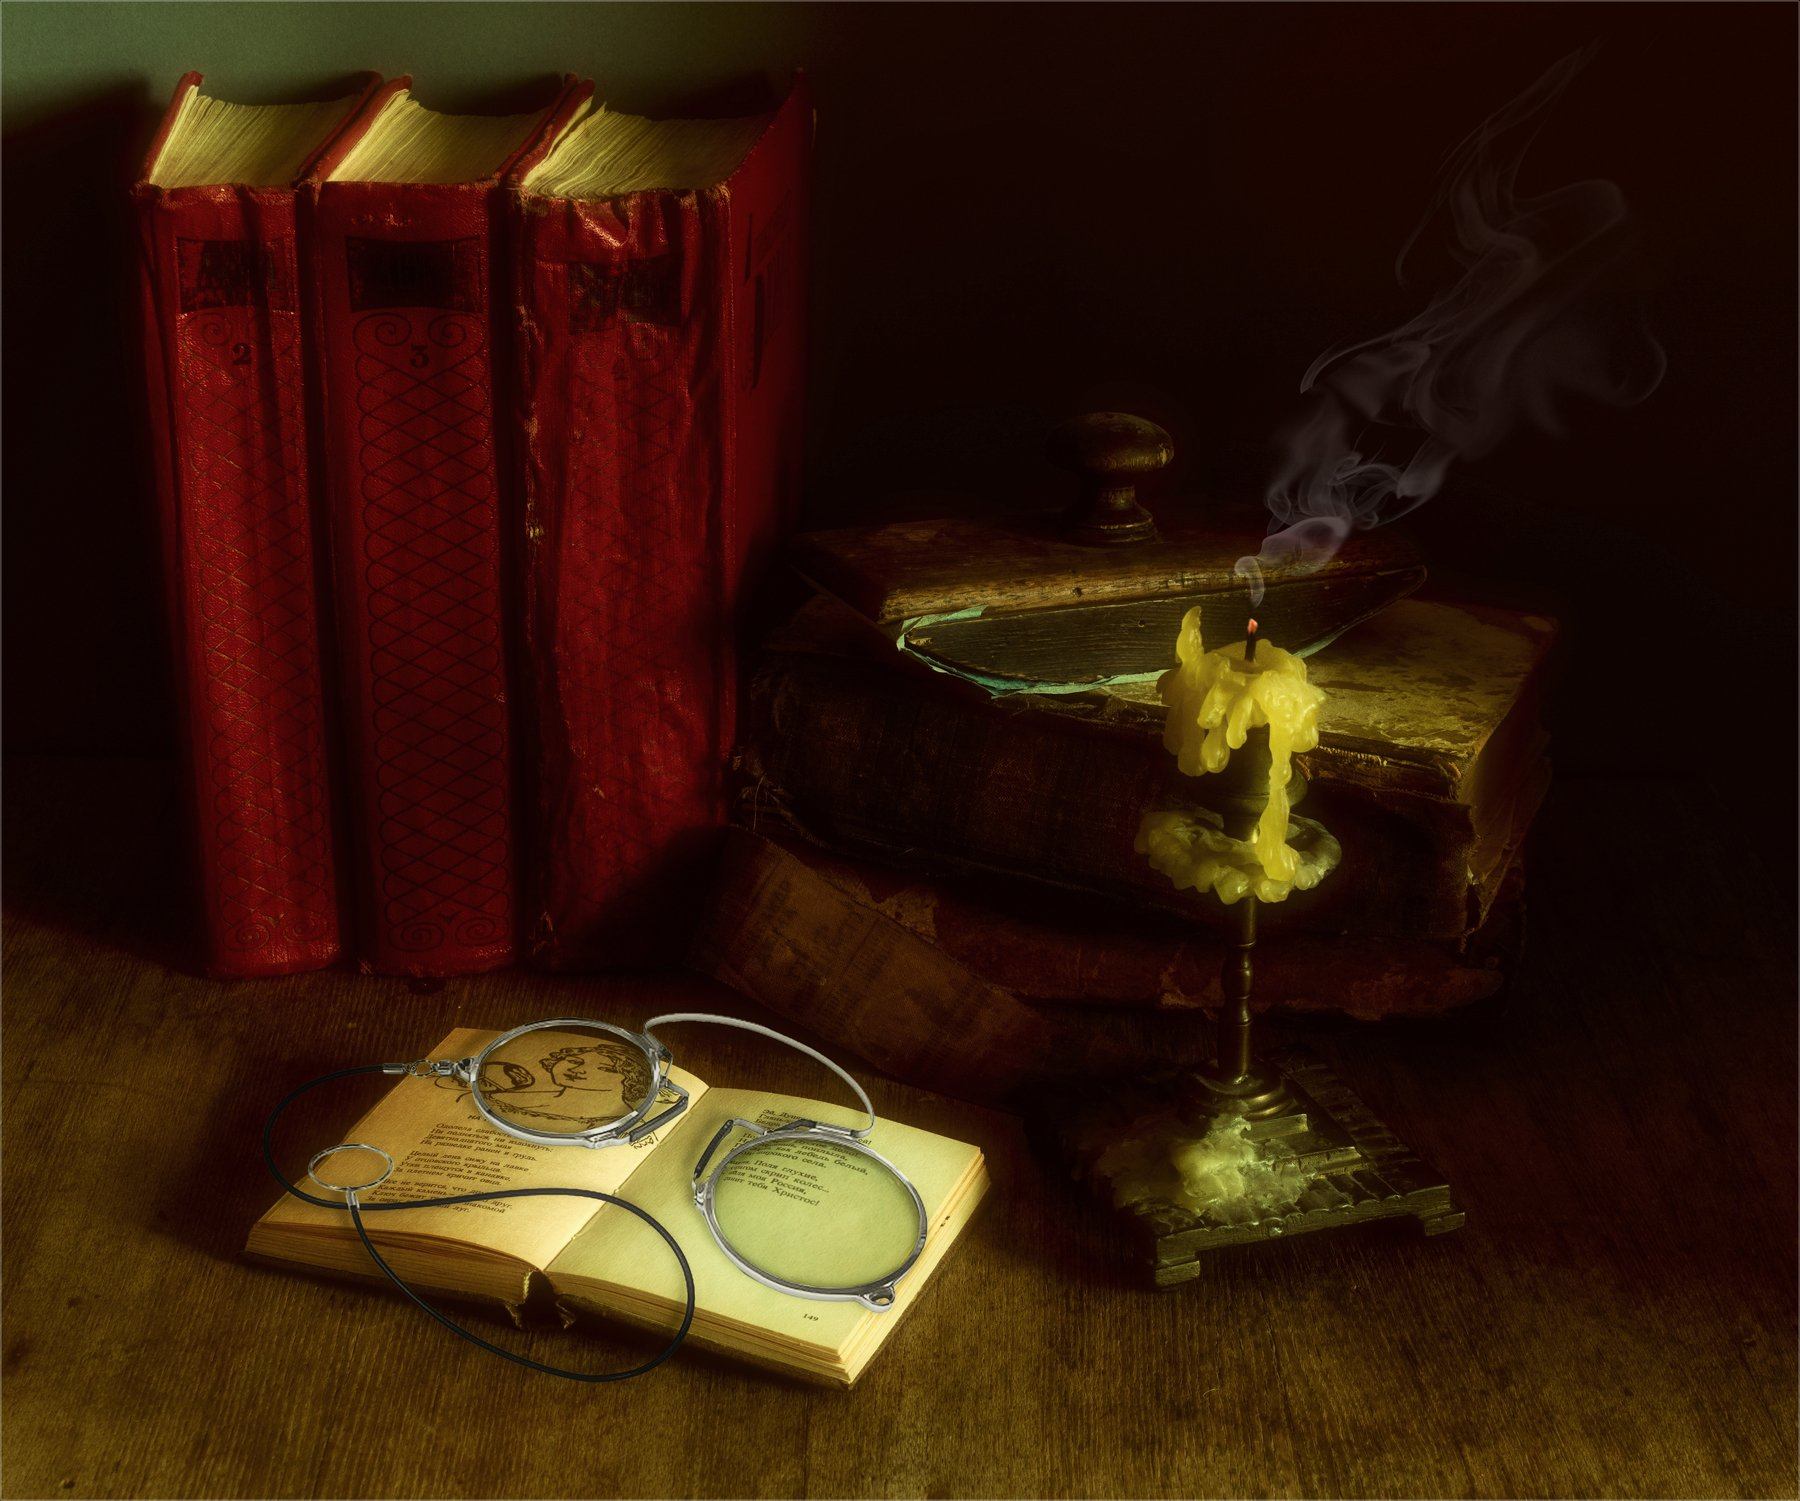 still life, натюрморт,  винтаж, ретро, книга, книги, свеча, пенсне, дым, пресс-папье, Михаил MSH